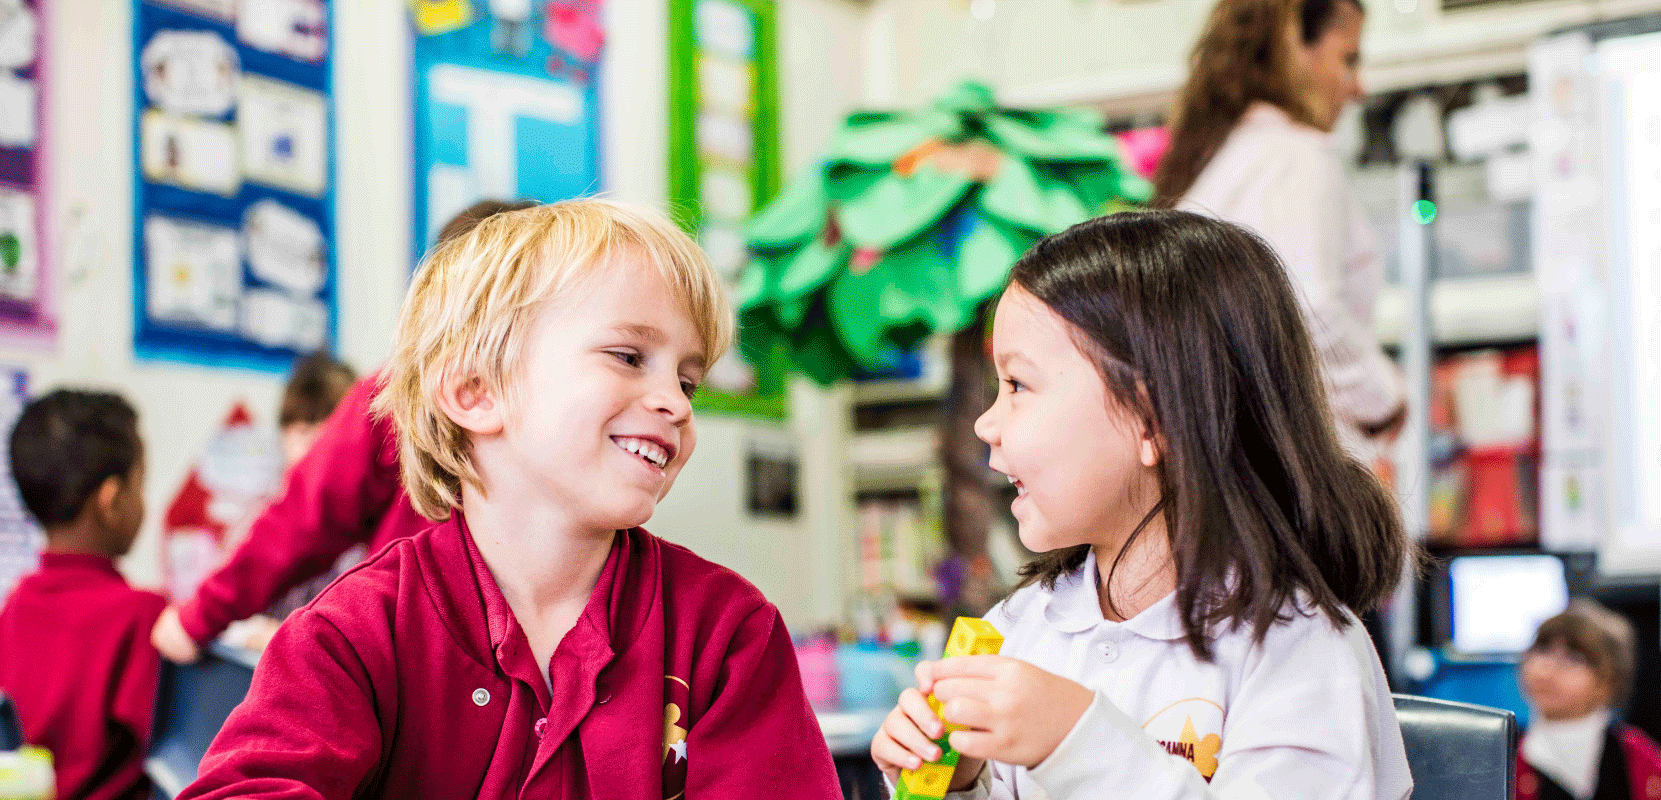 Resources to build leadership in Australian schools